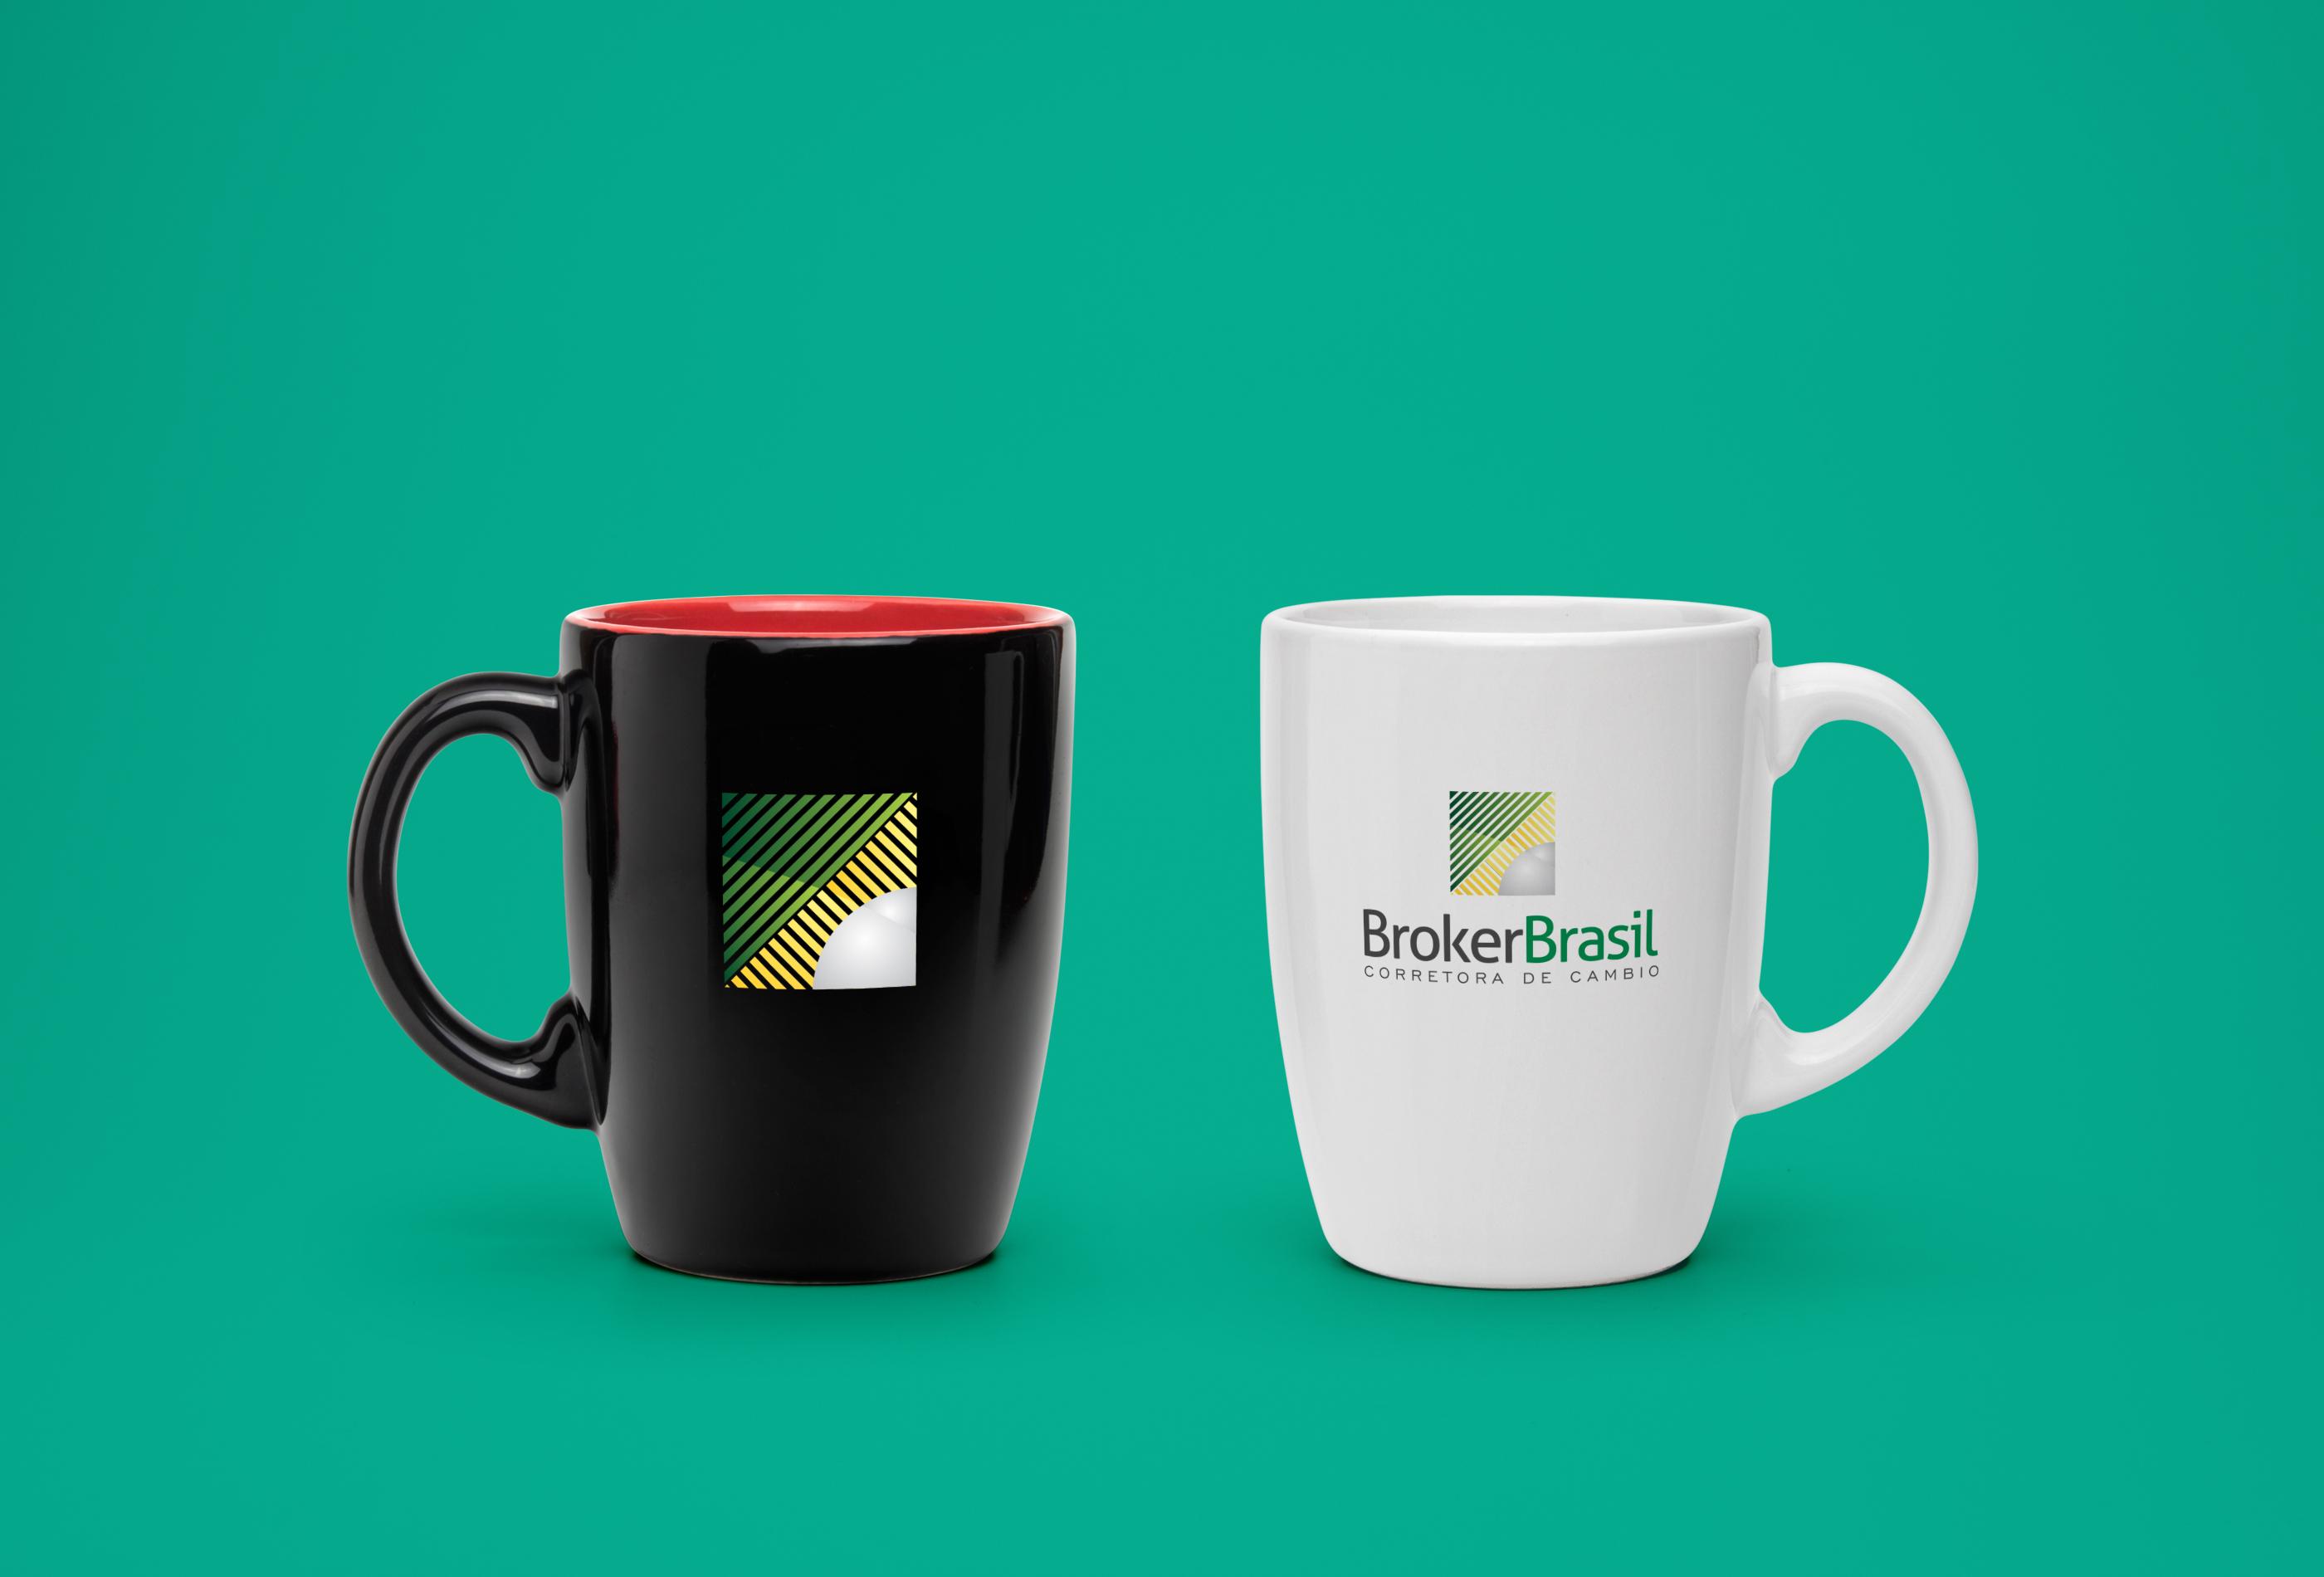 moo_design_broker_brasil_3